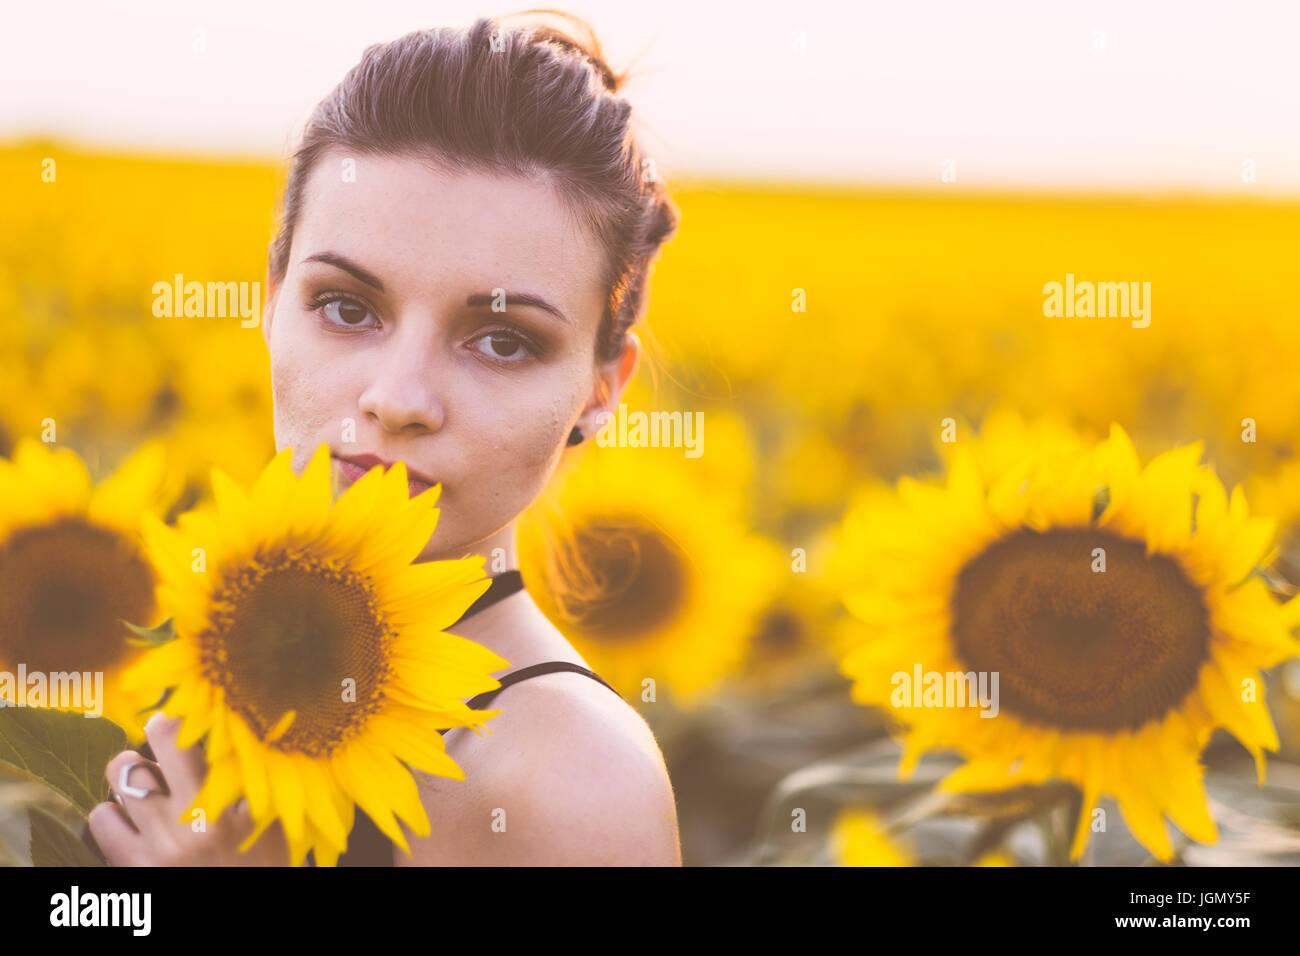 Schöne natürliche junge Frau im Sonnenblumenfeld im Sommer Sonnenuntergang Stockbild